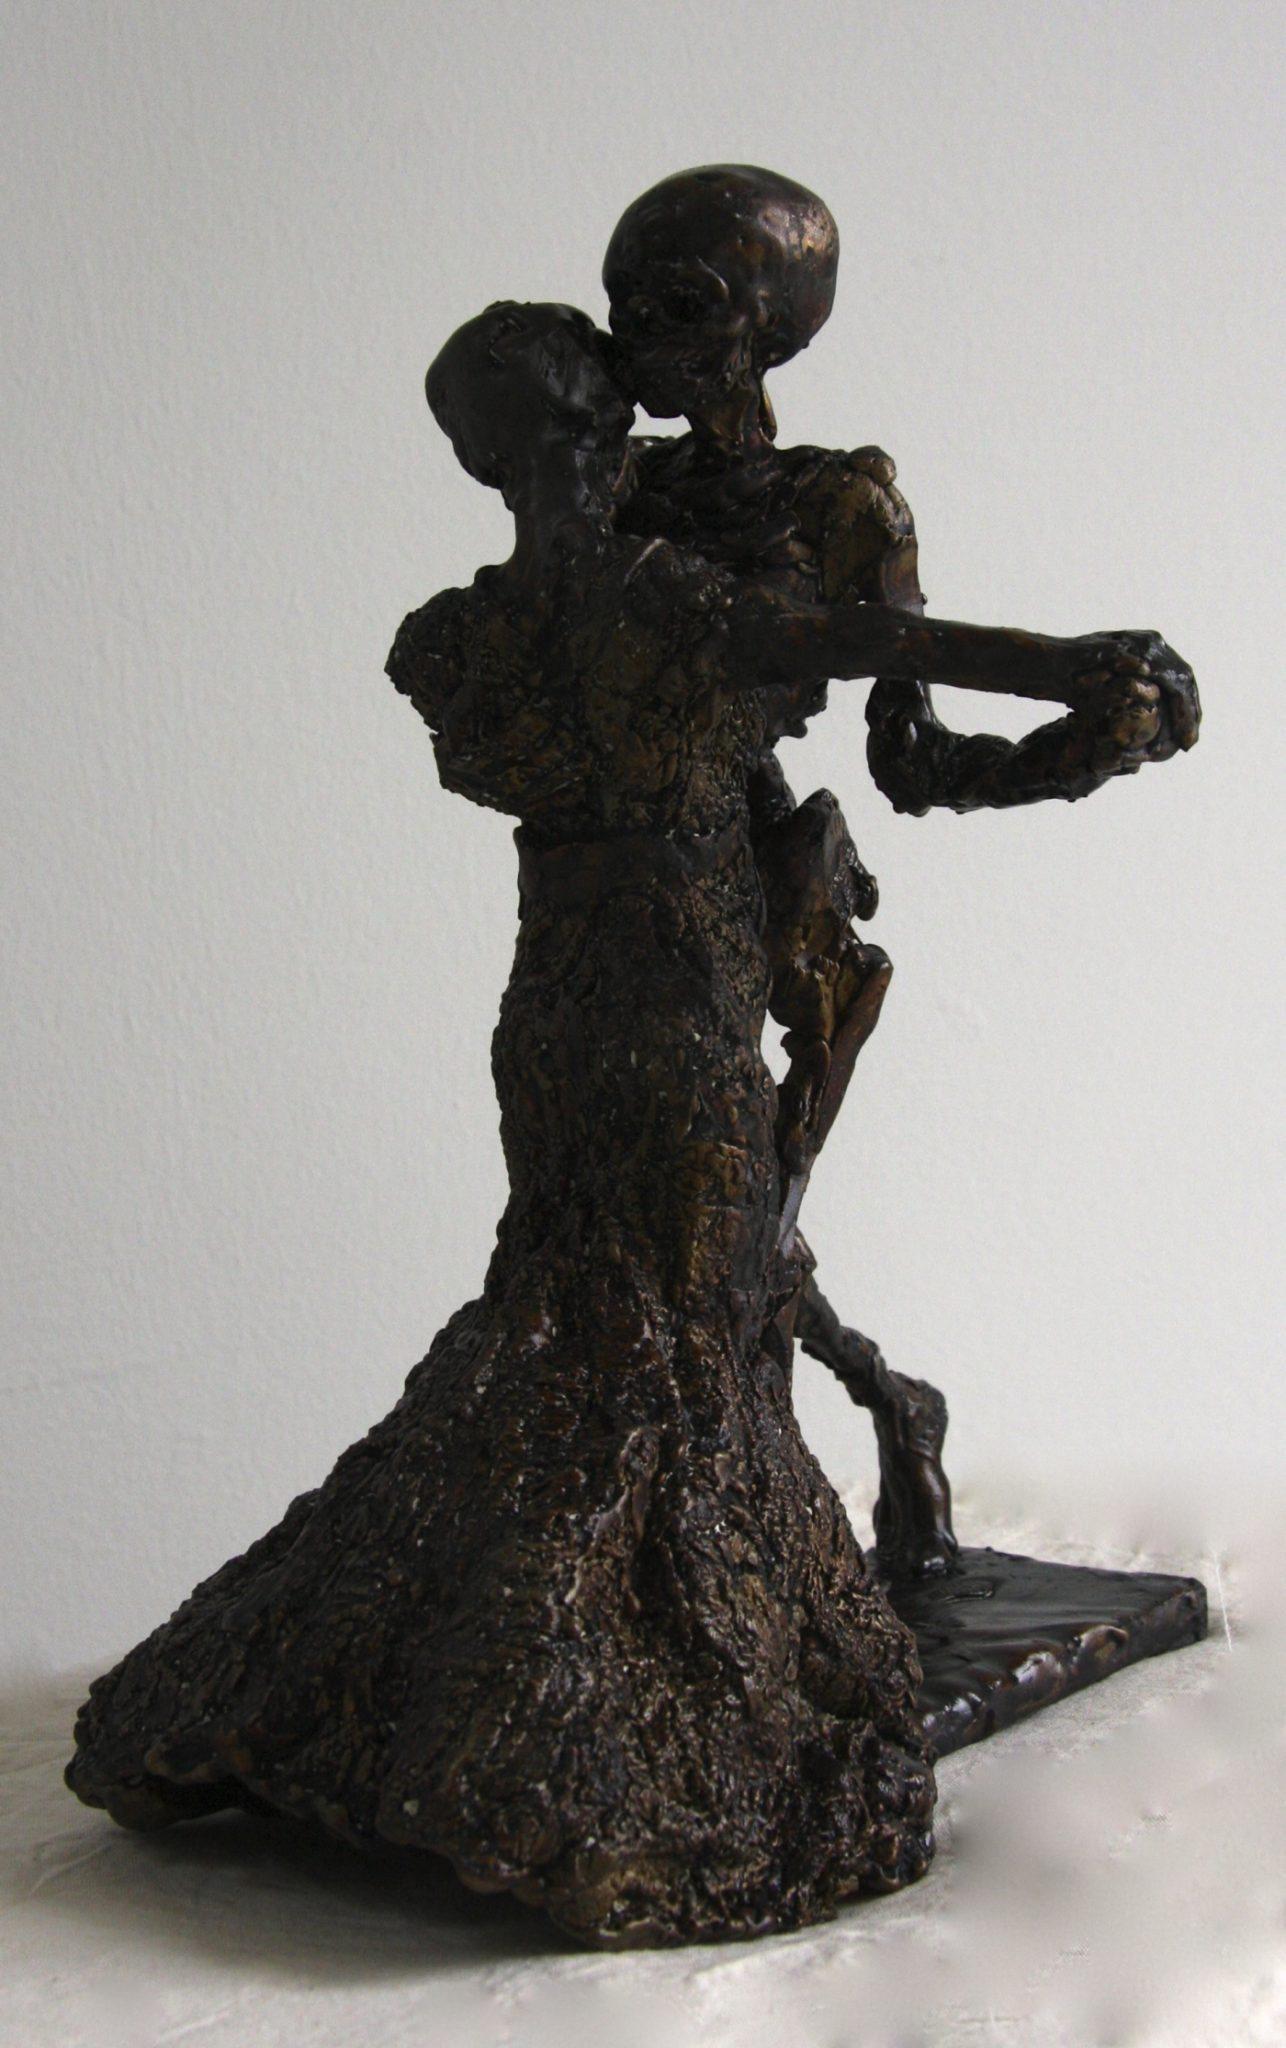 Valse Macabre, h 35cm